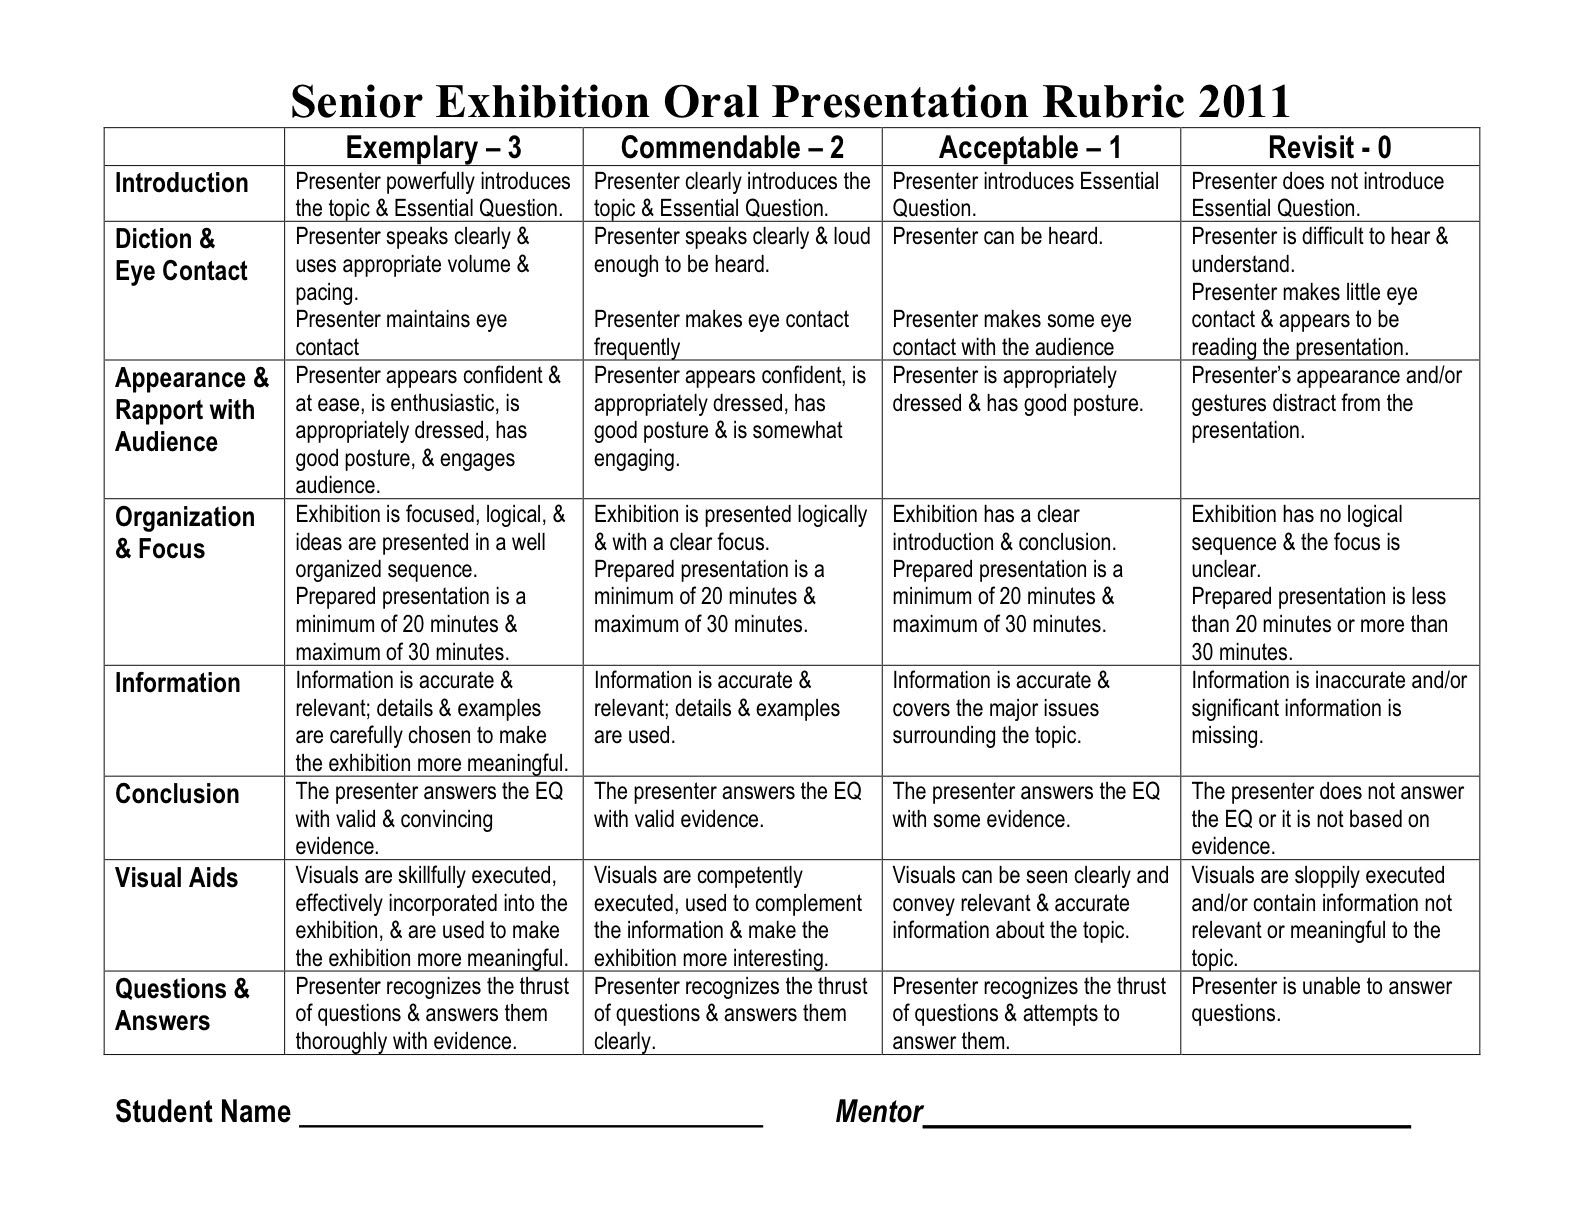 Rubric For Oral Presentation College